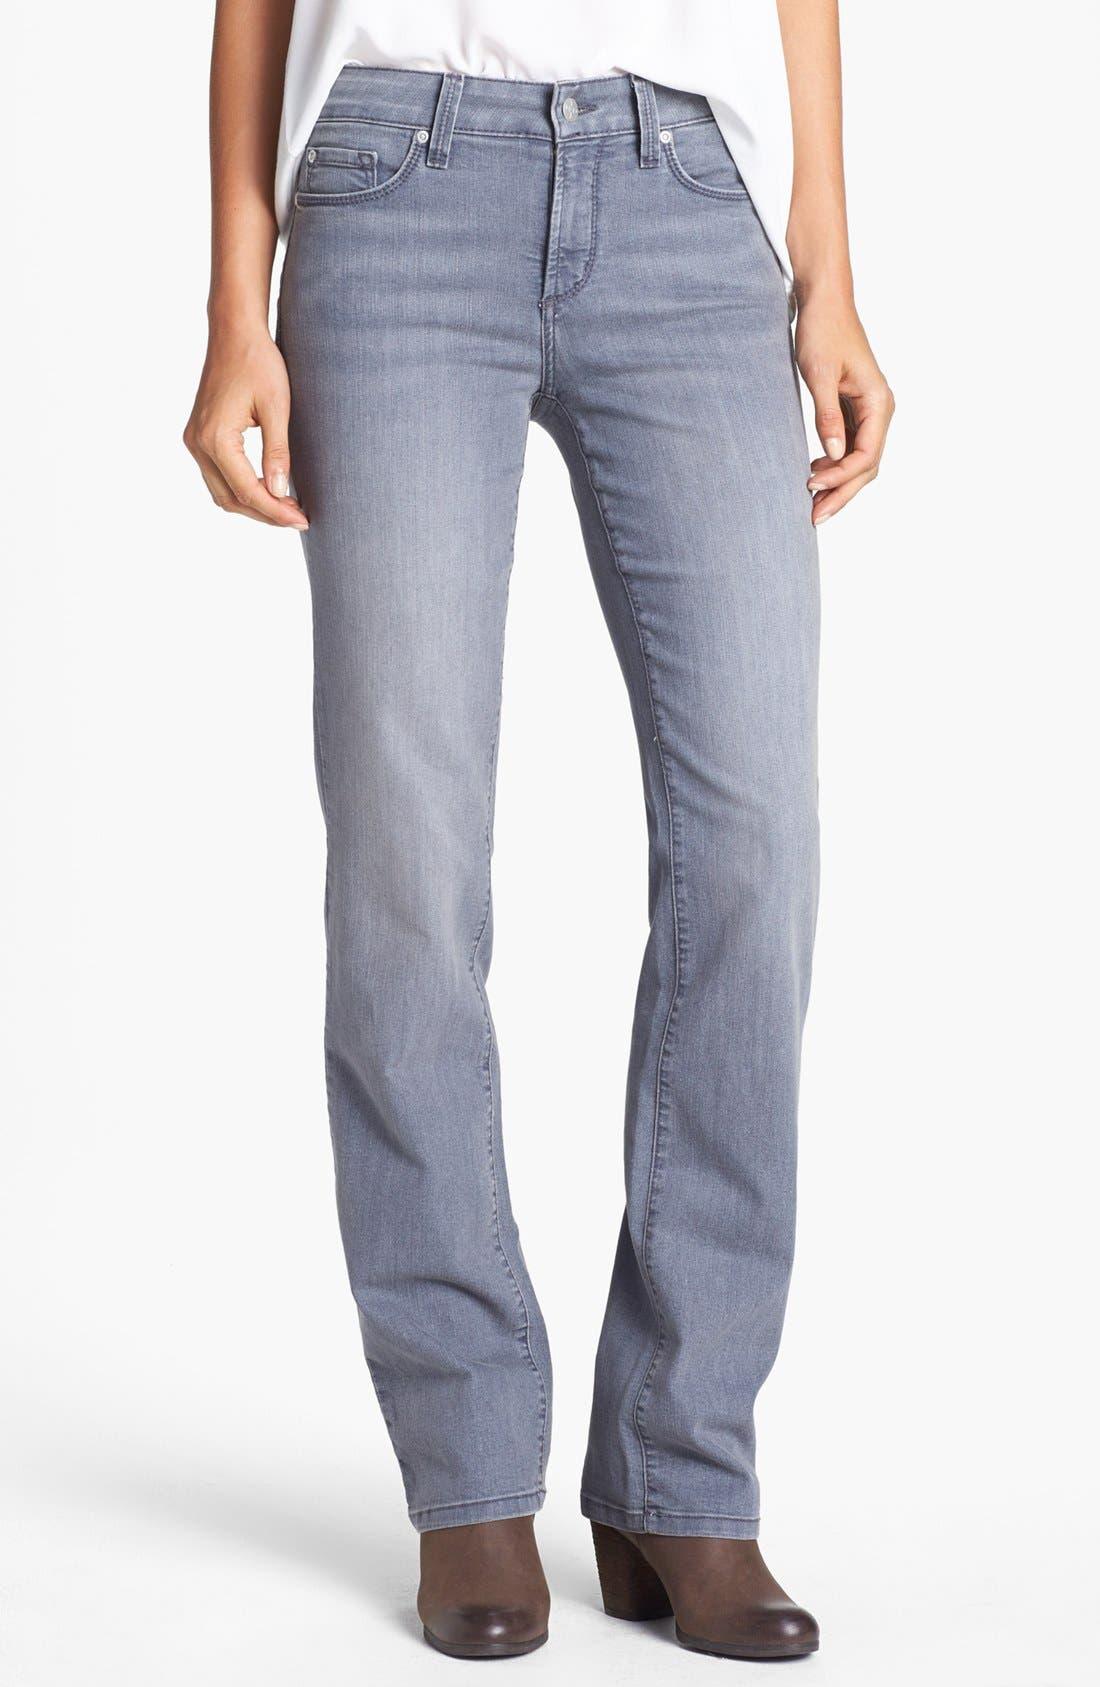 Main Image - NYDJ 'Marilyn' Straight Leg Jeans (Grey) (Petite)